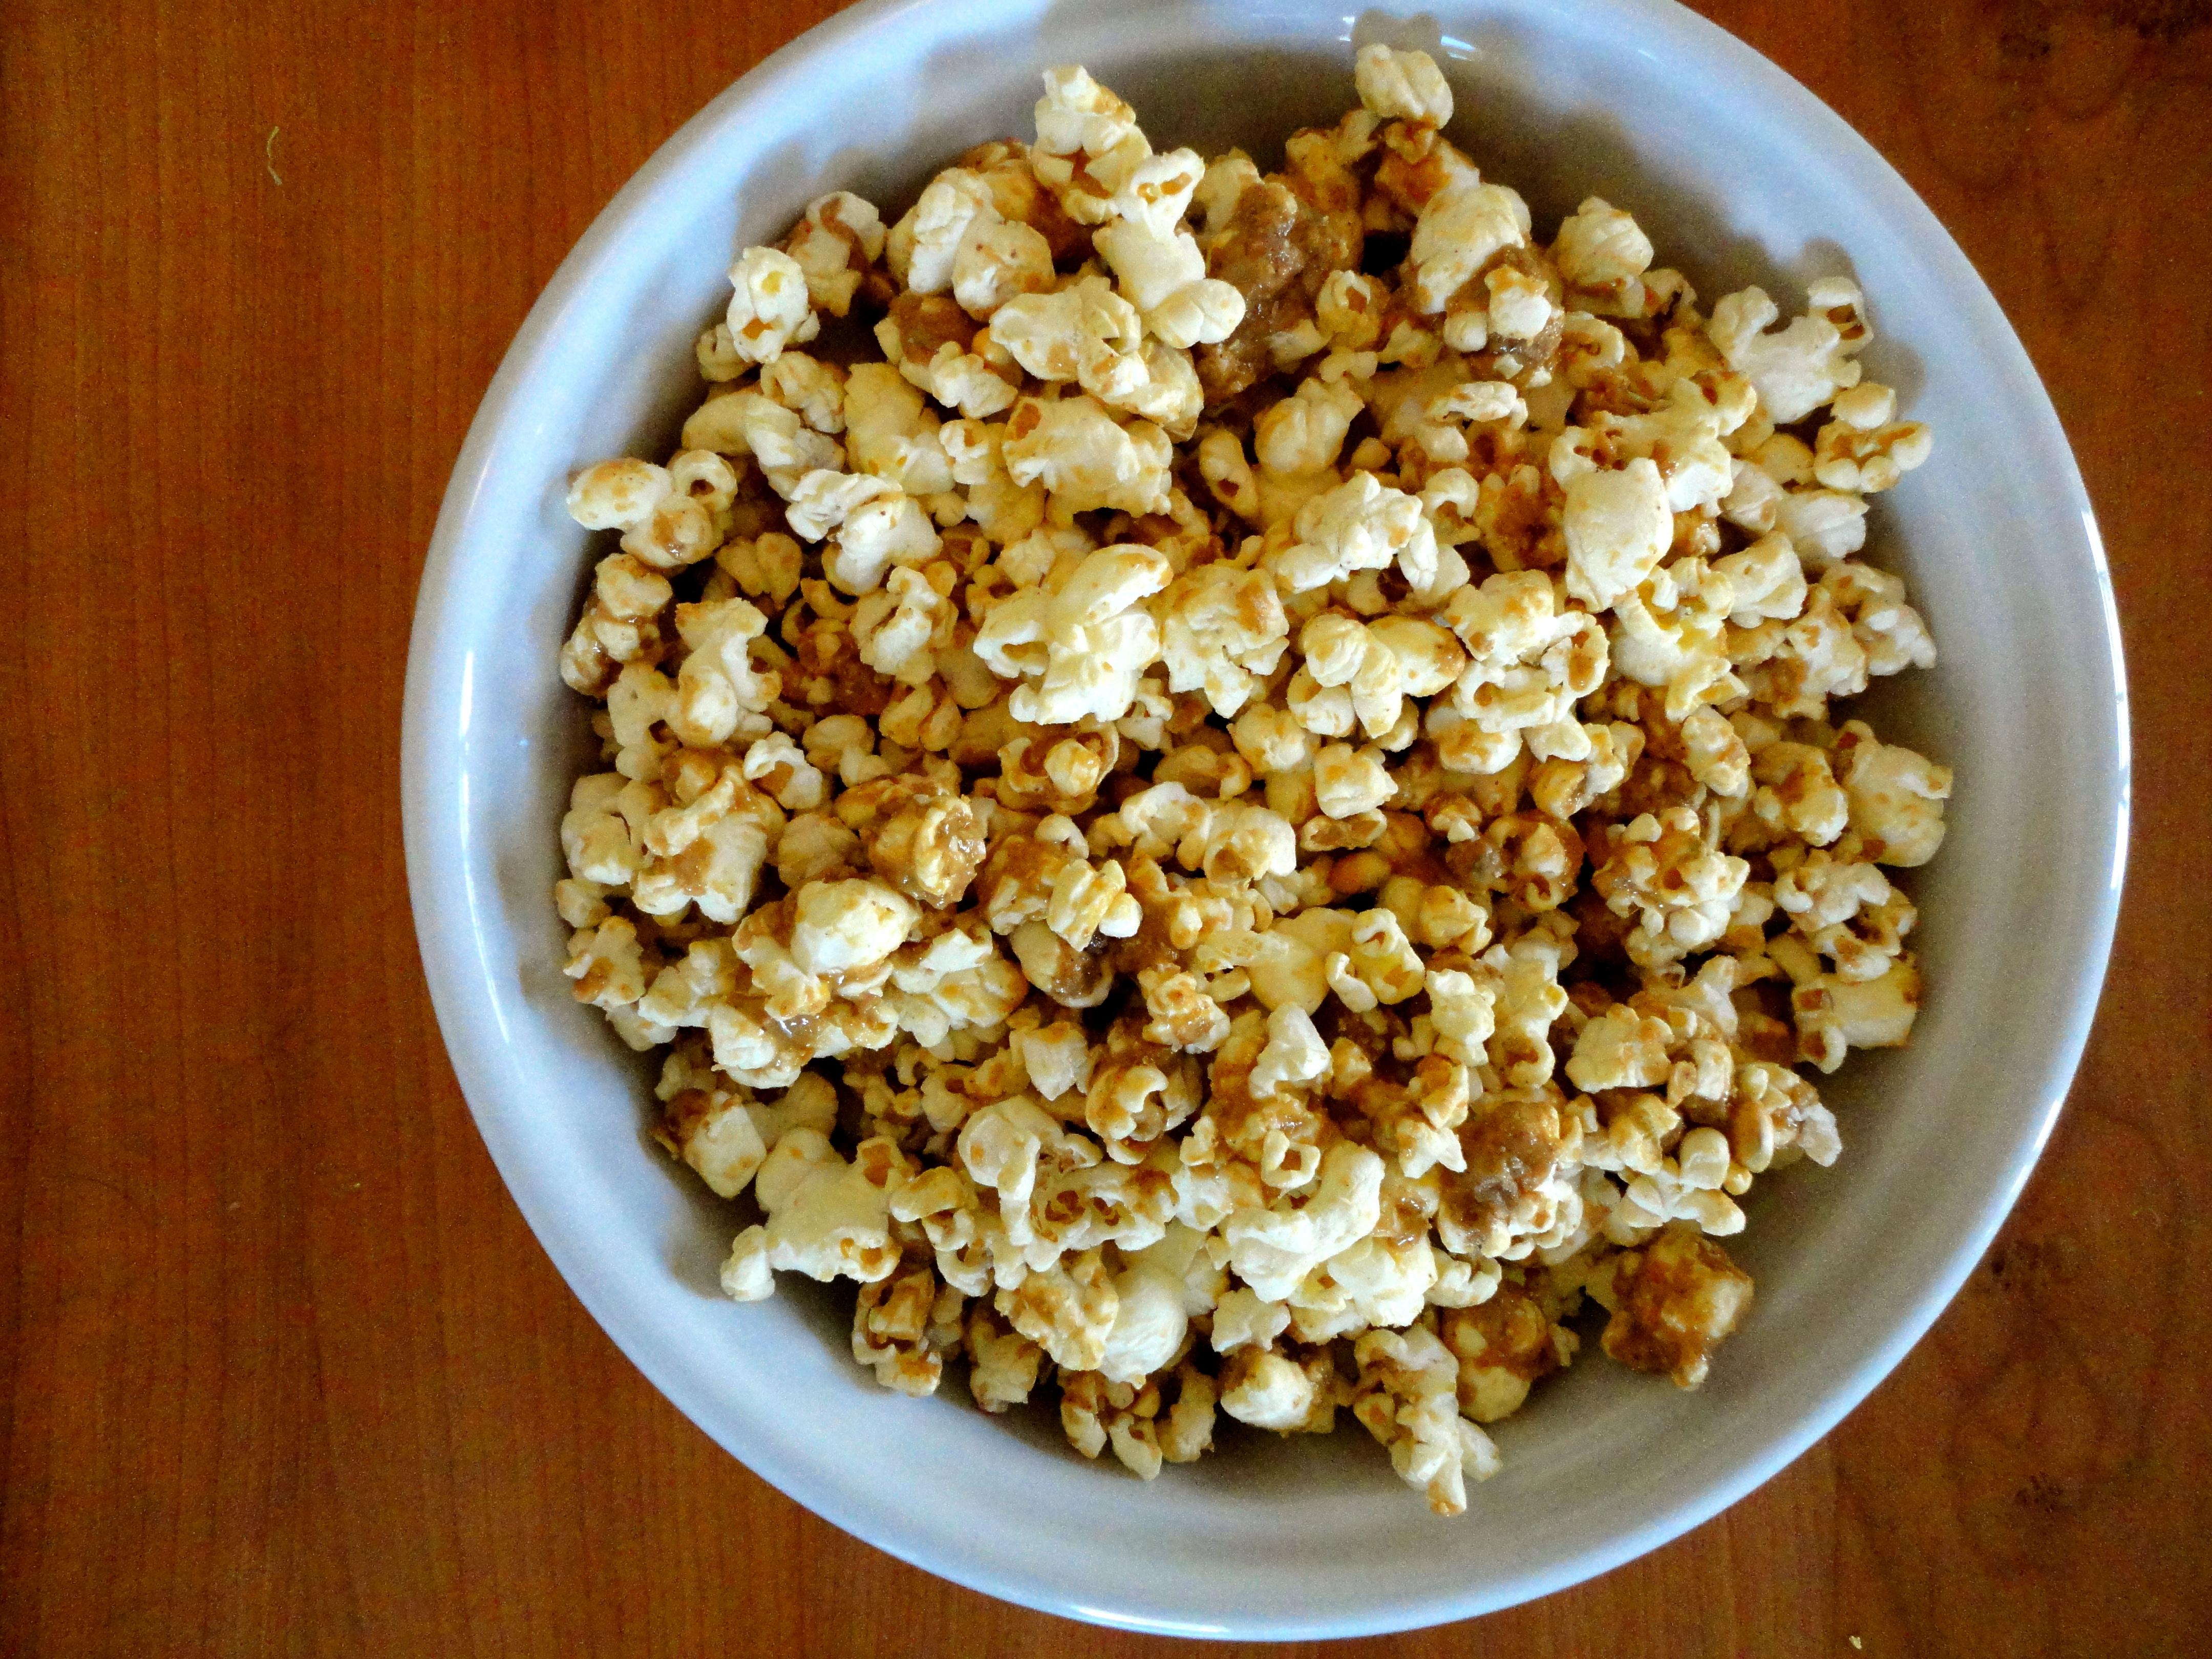 ... Snack Healthy – Vanilla Cinnamon Peanut Butter Popcorn | How to Eat